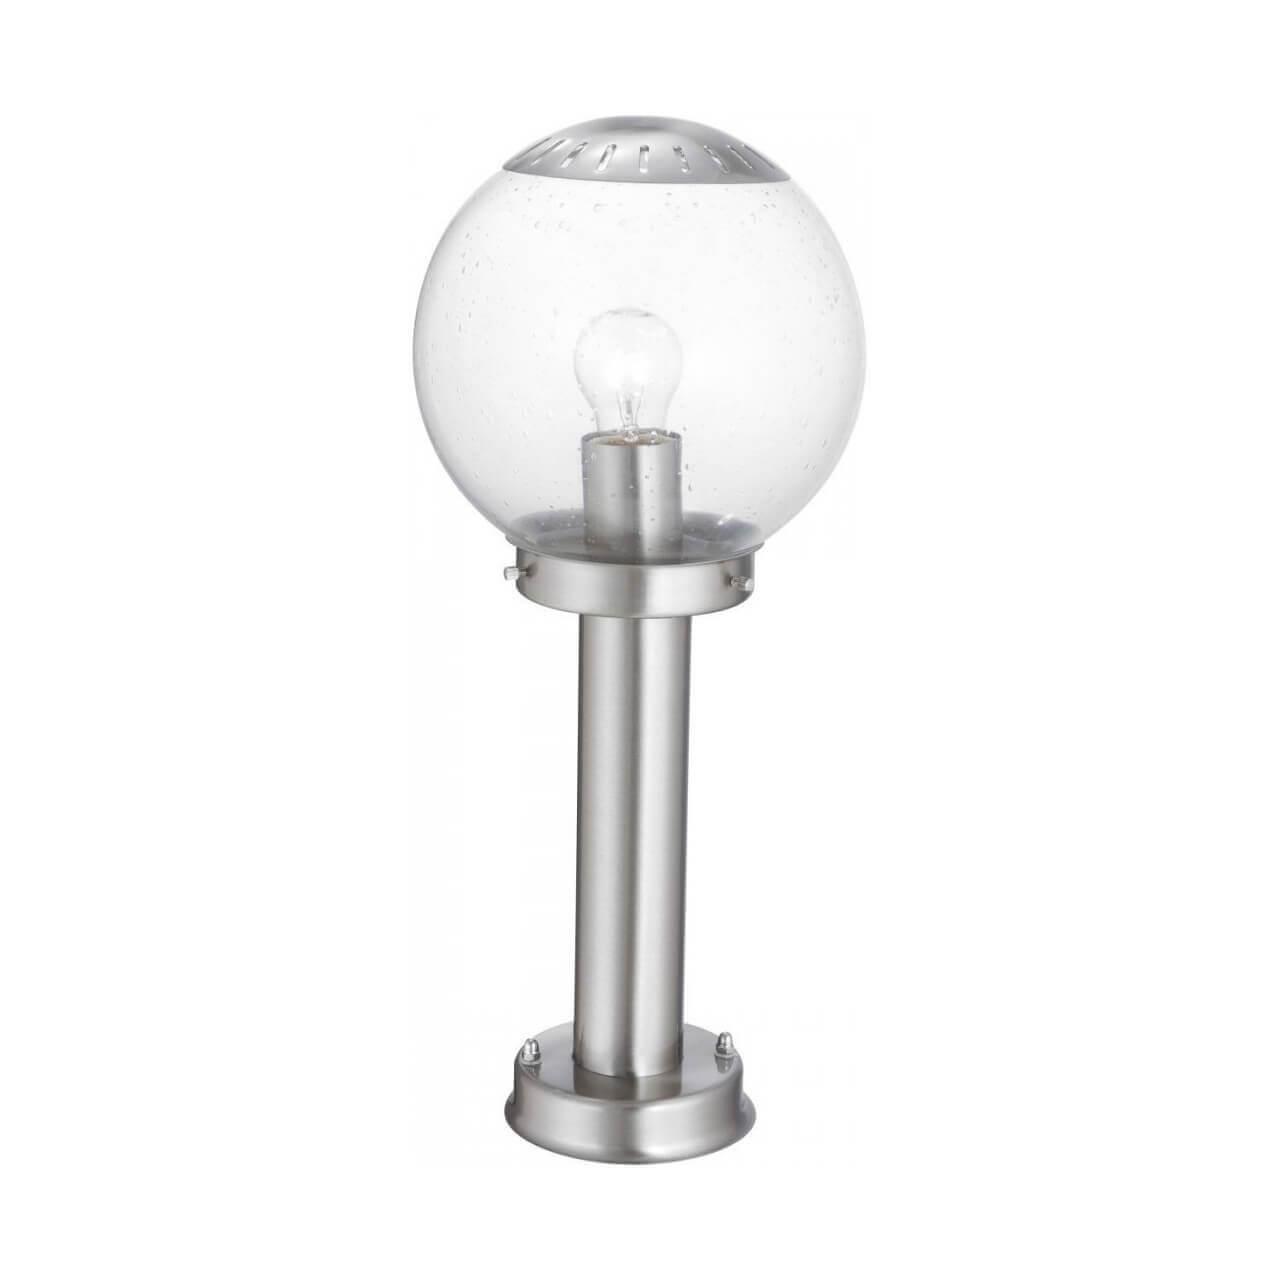 Уличный светильник Globo Bowle II 3181 globo фонарь bowle ii 1xe27x60 вт 110 см qvhilta